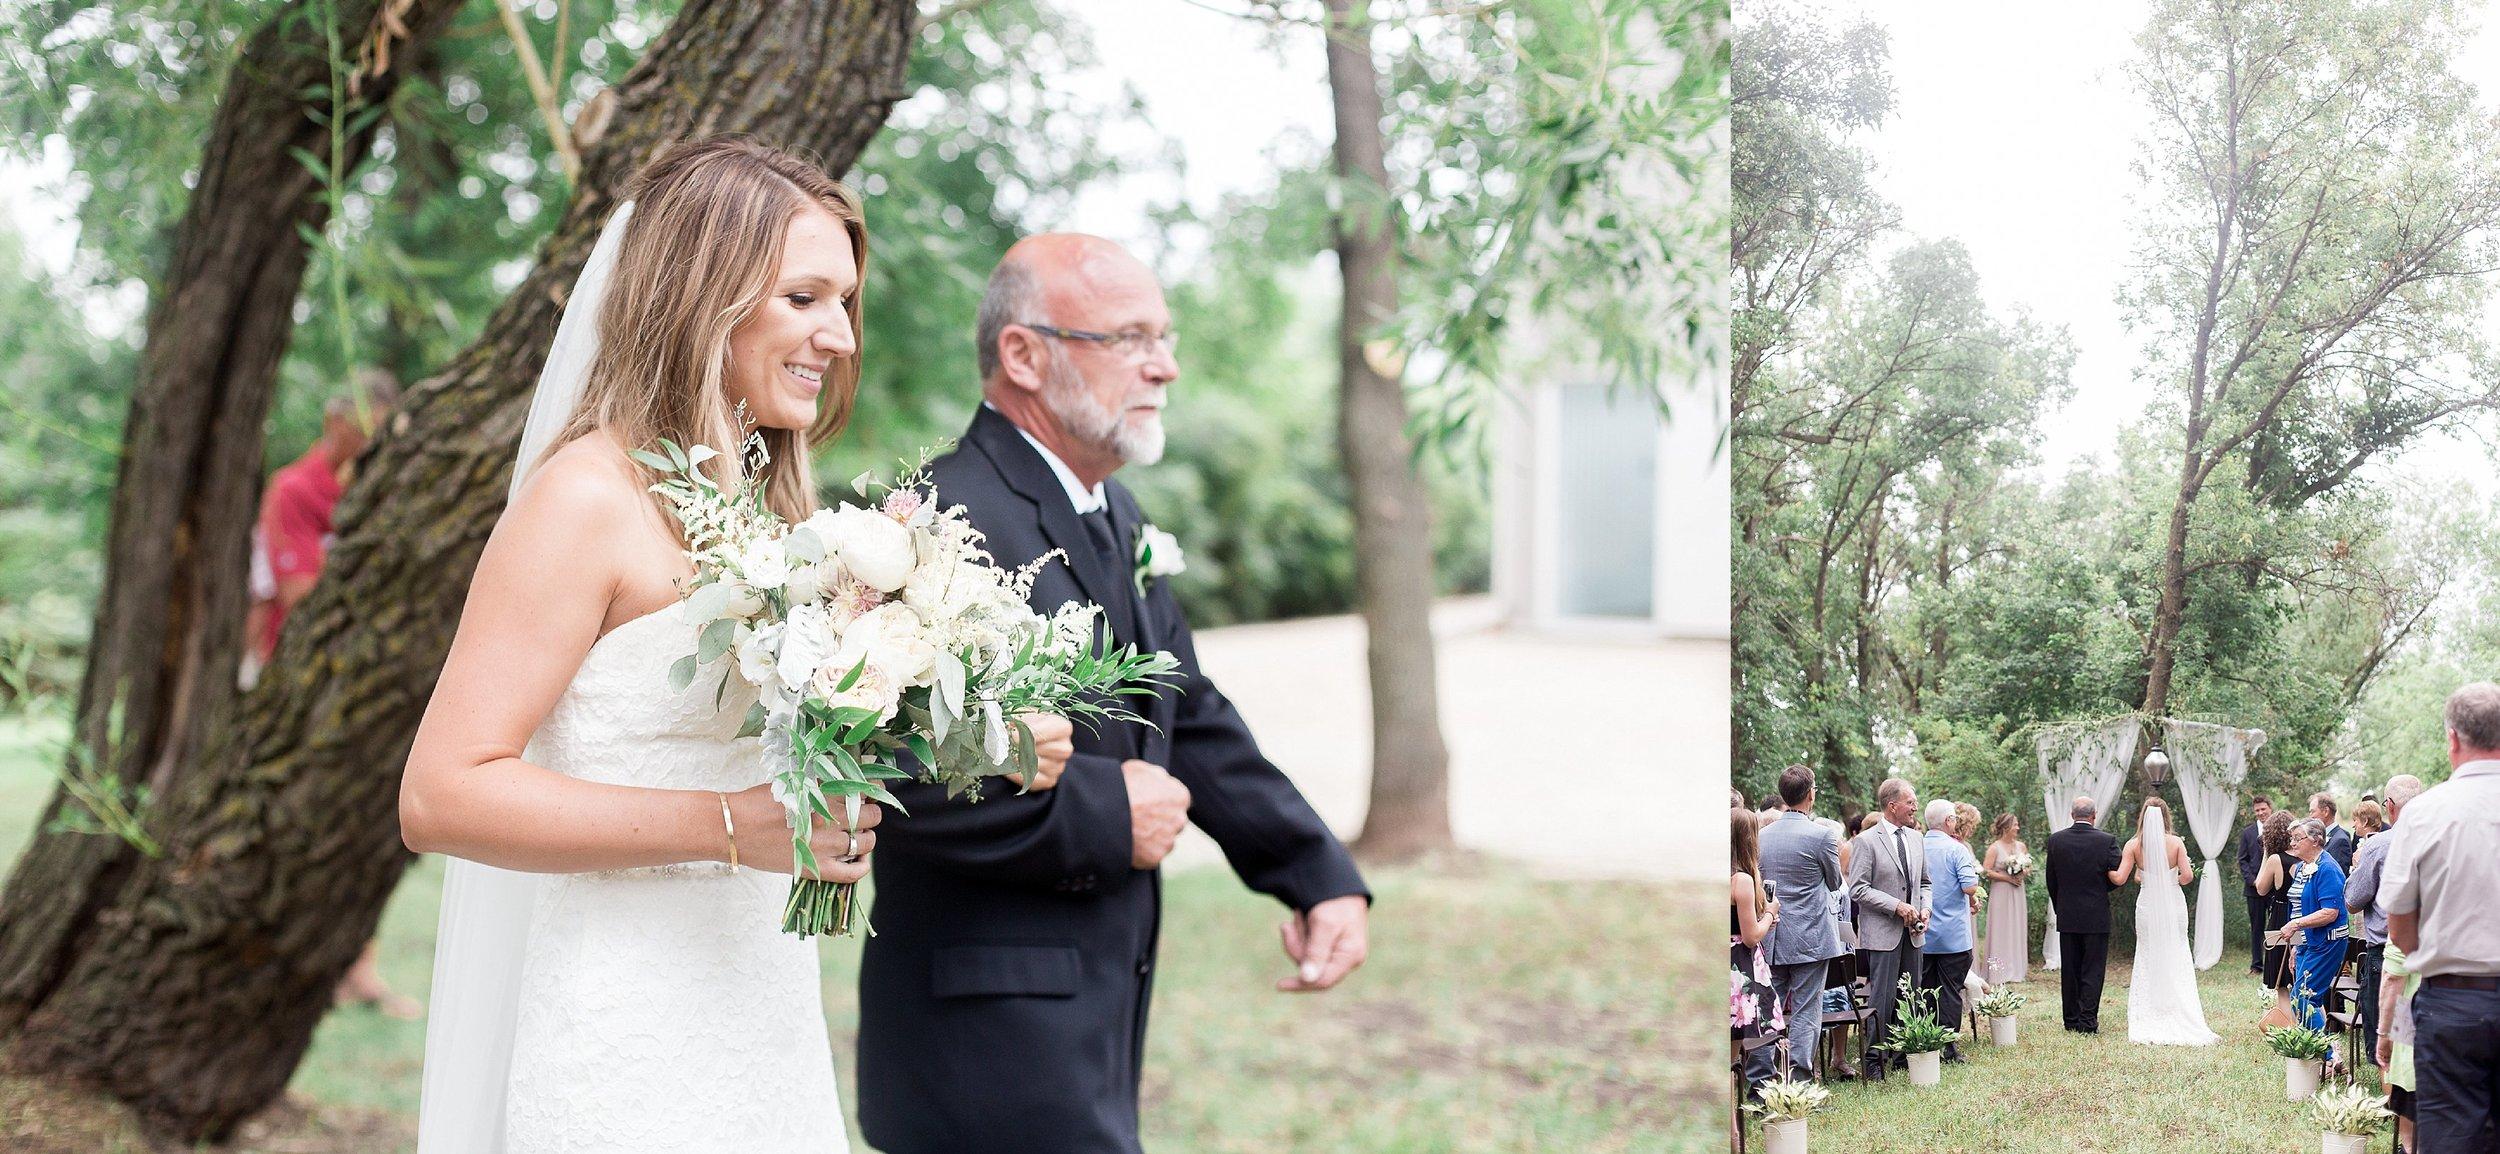 Manitoba wedding photographer   Keila Marie Photography   Garden inspired wedding   Intimate backyard wedding